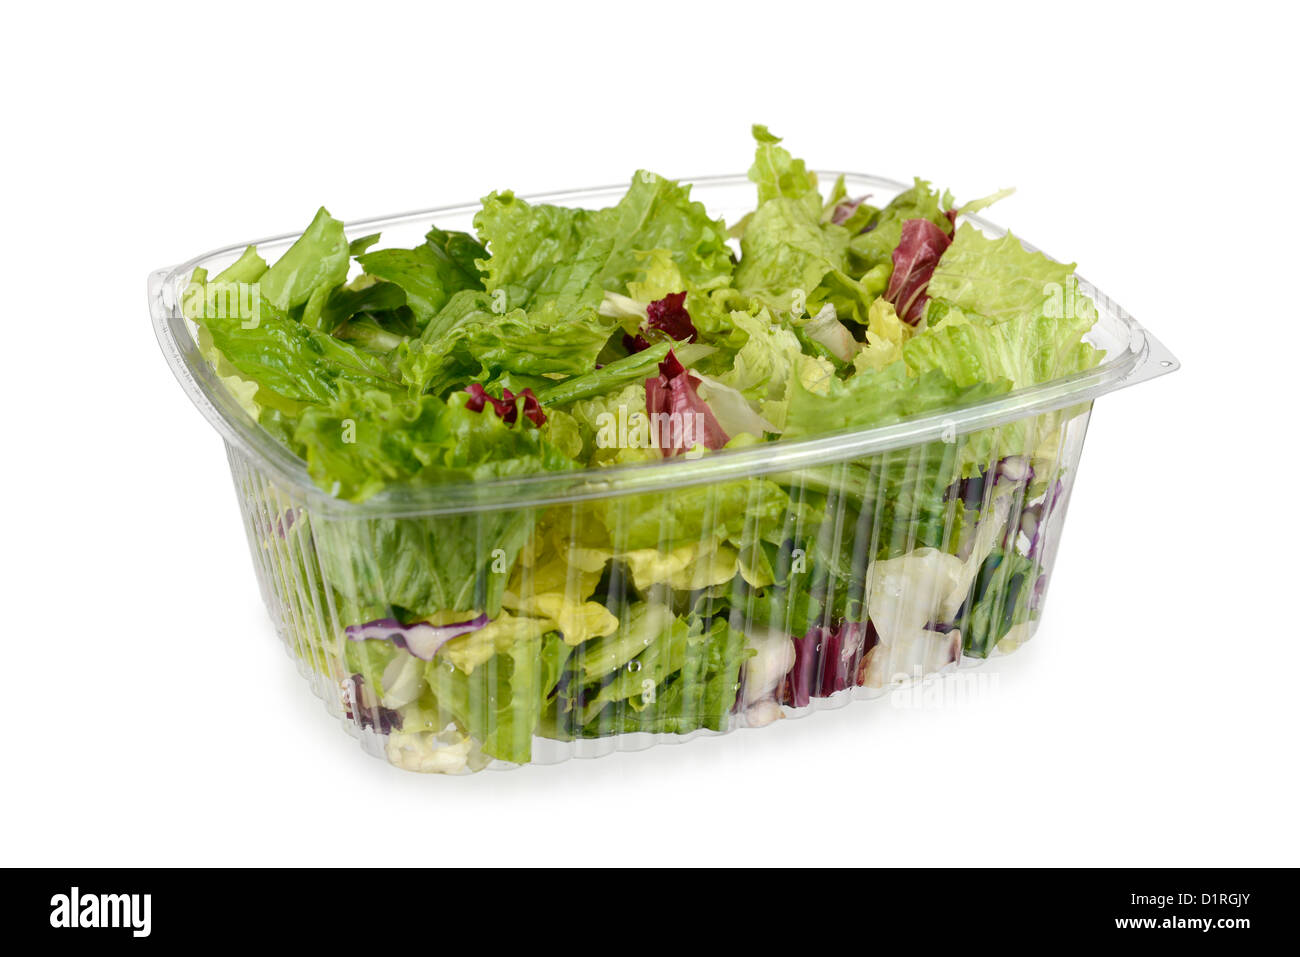 Salat, Rotkohl, Salatblätter, Plastikbehälter verpackt Stockbild